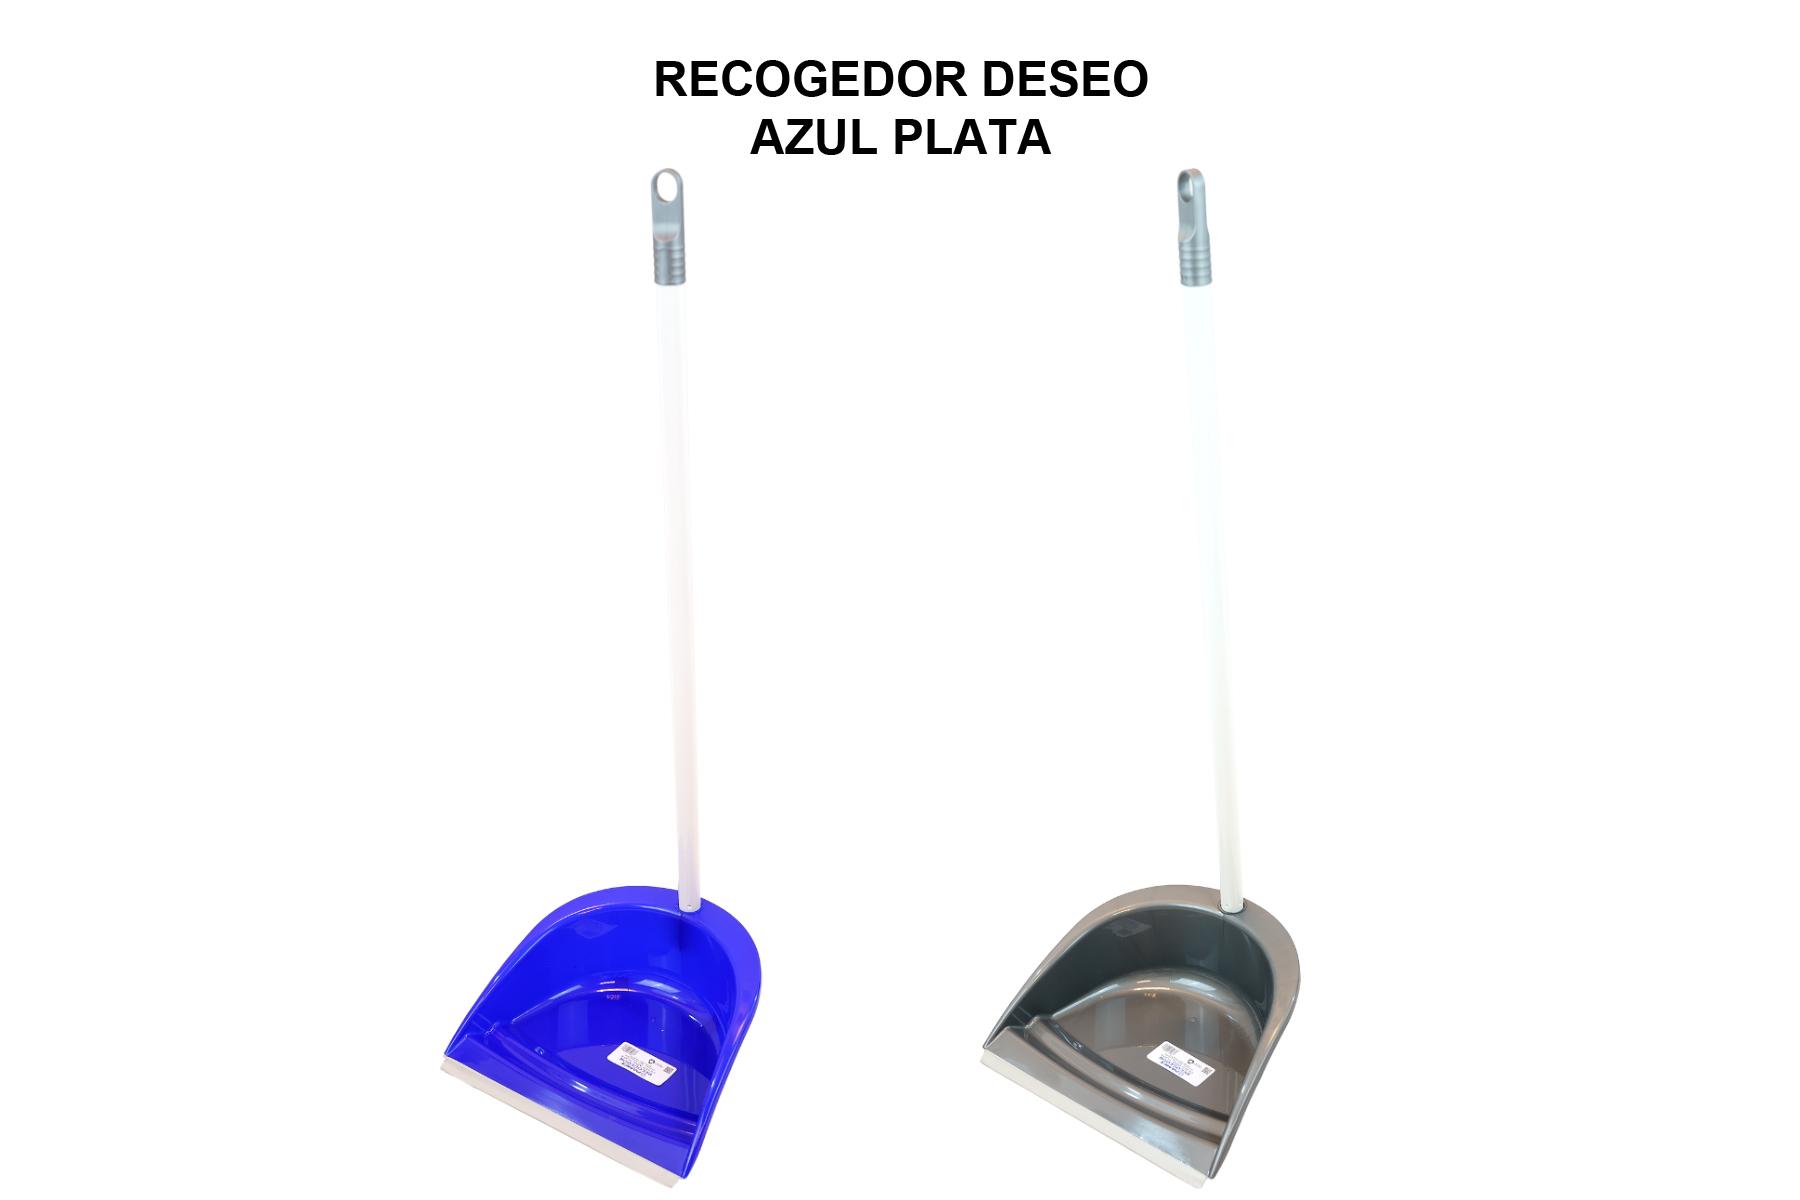 RECOGEDOR DESEO AZUL PLATA